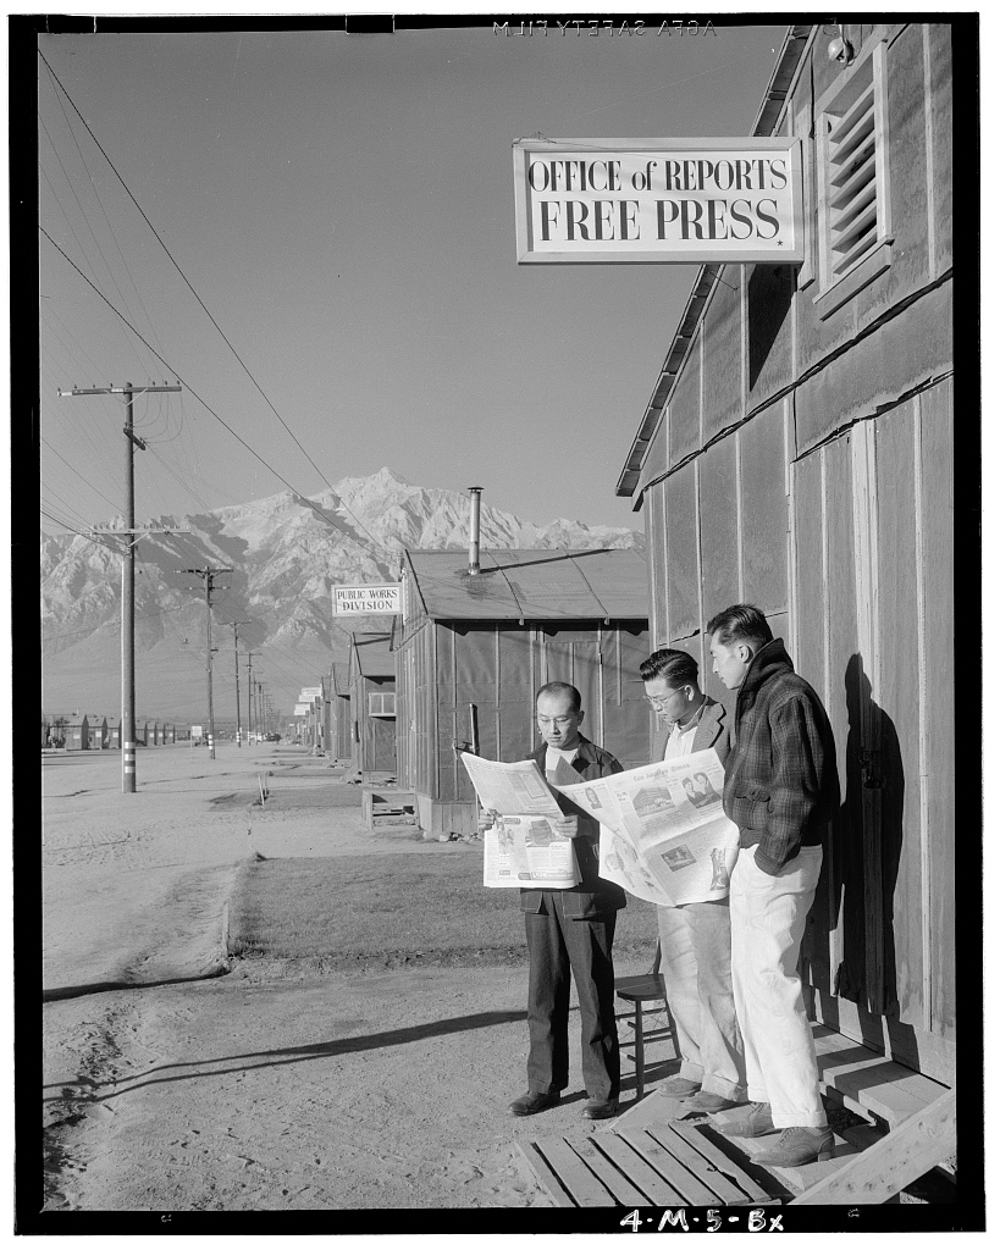 Roy Takeno (Editor) and group reading Manzanar paper [i.e. Los Angeles Times] in front of office, Yuichi Hirata, Nabuo Samamura, Manzanar Relocation Center, California